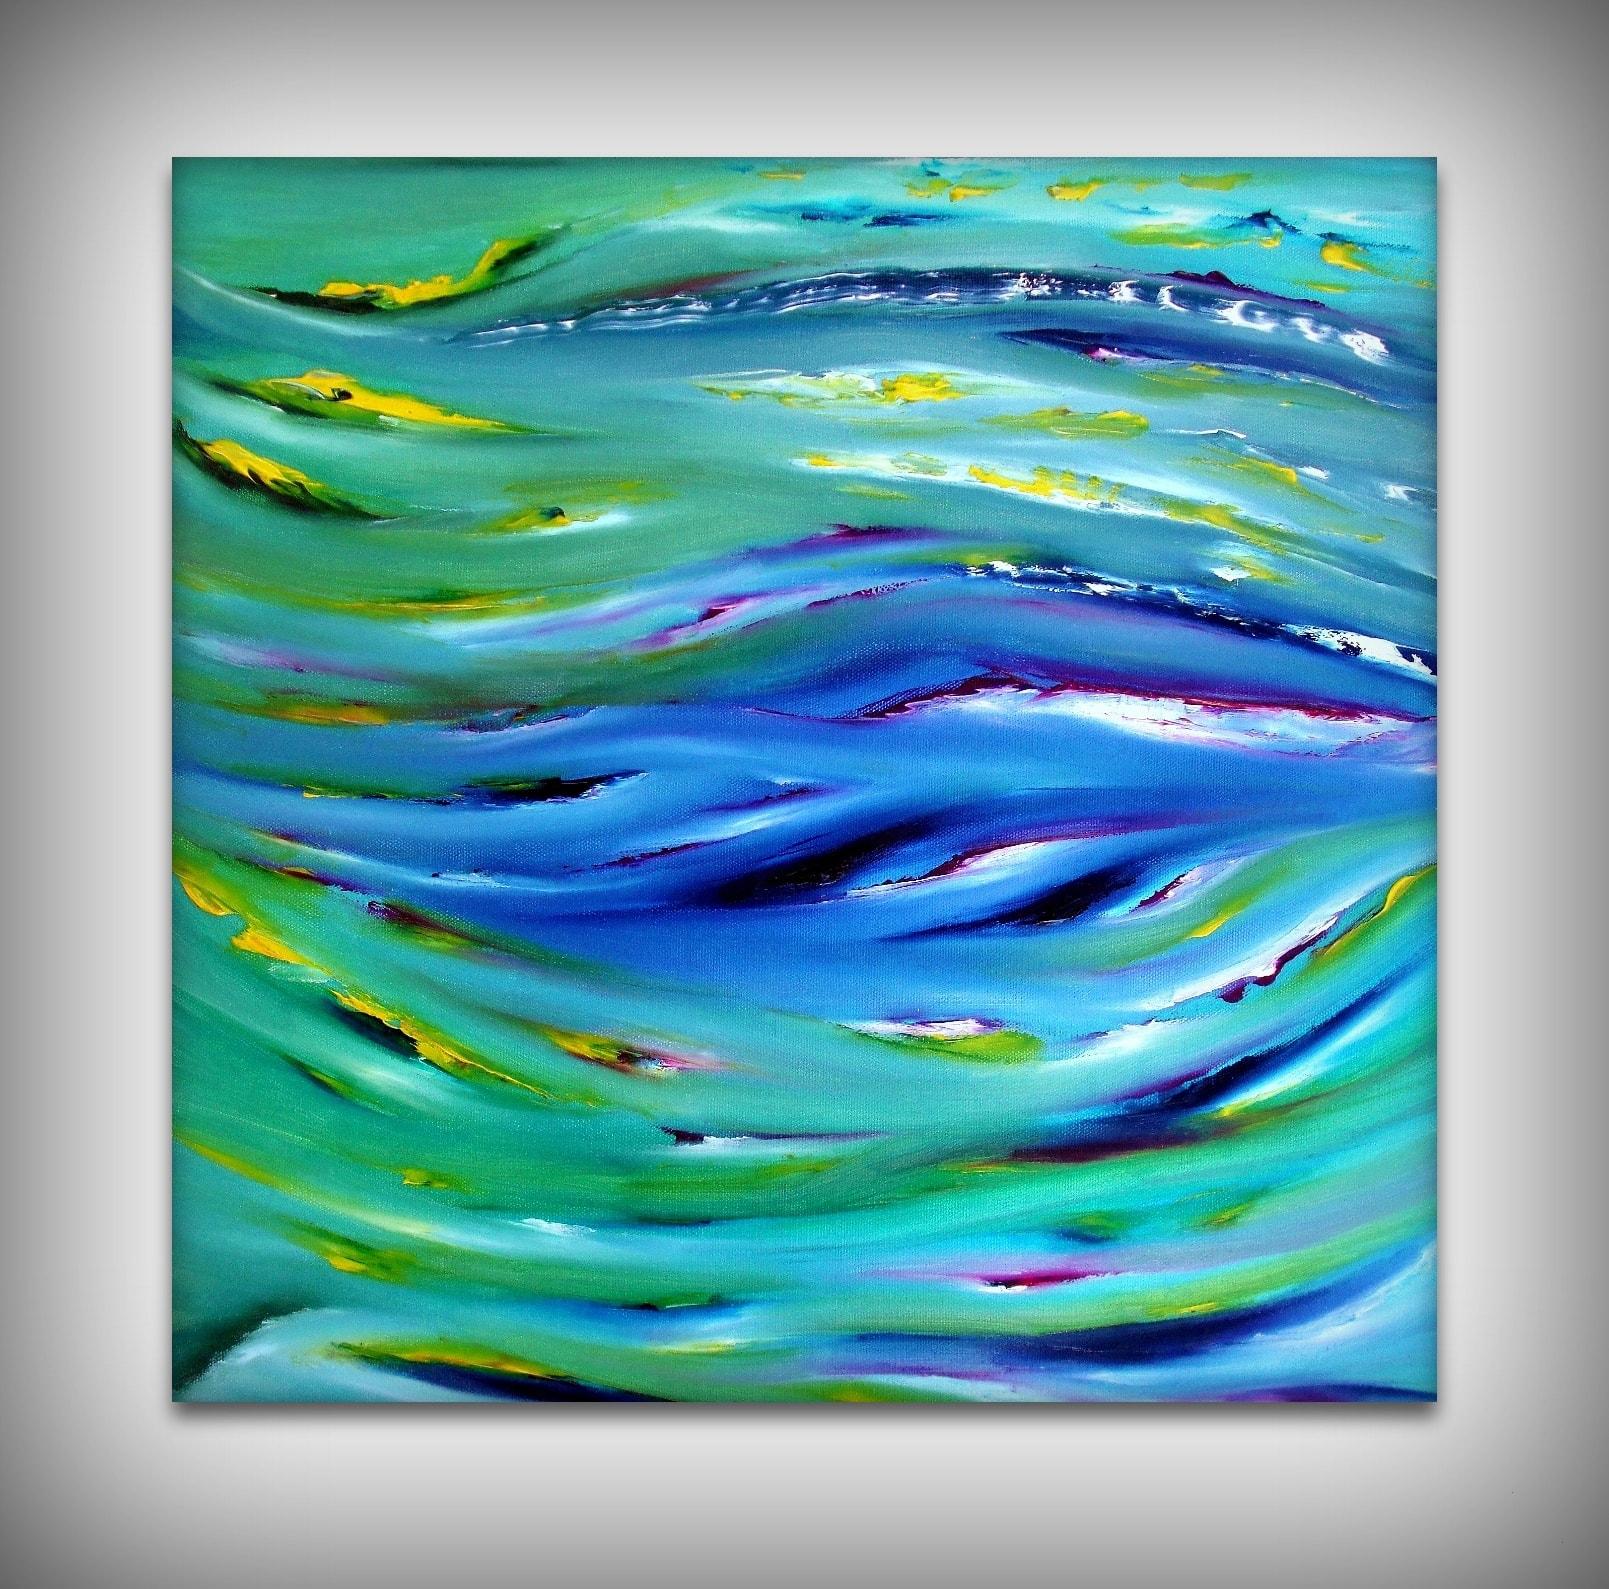 Color therapy, vendita online by Davide De Palma